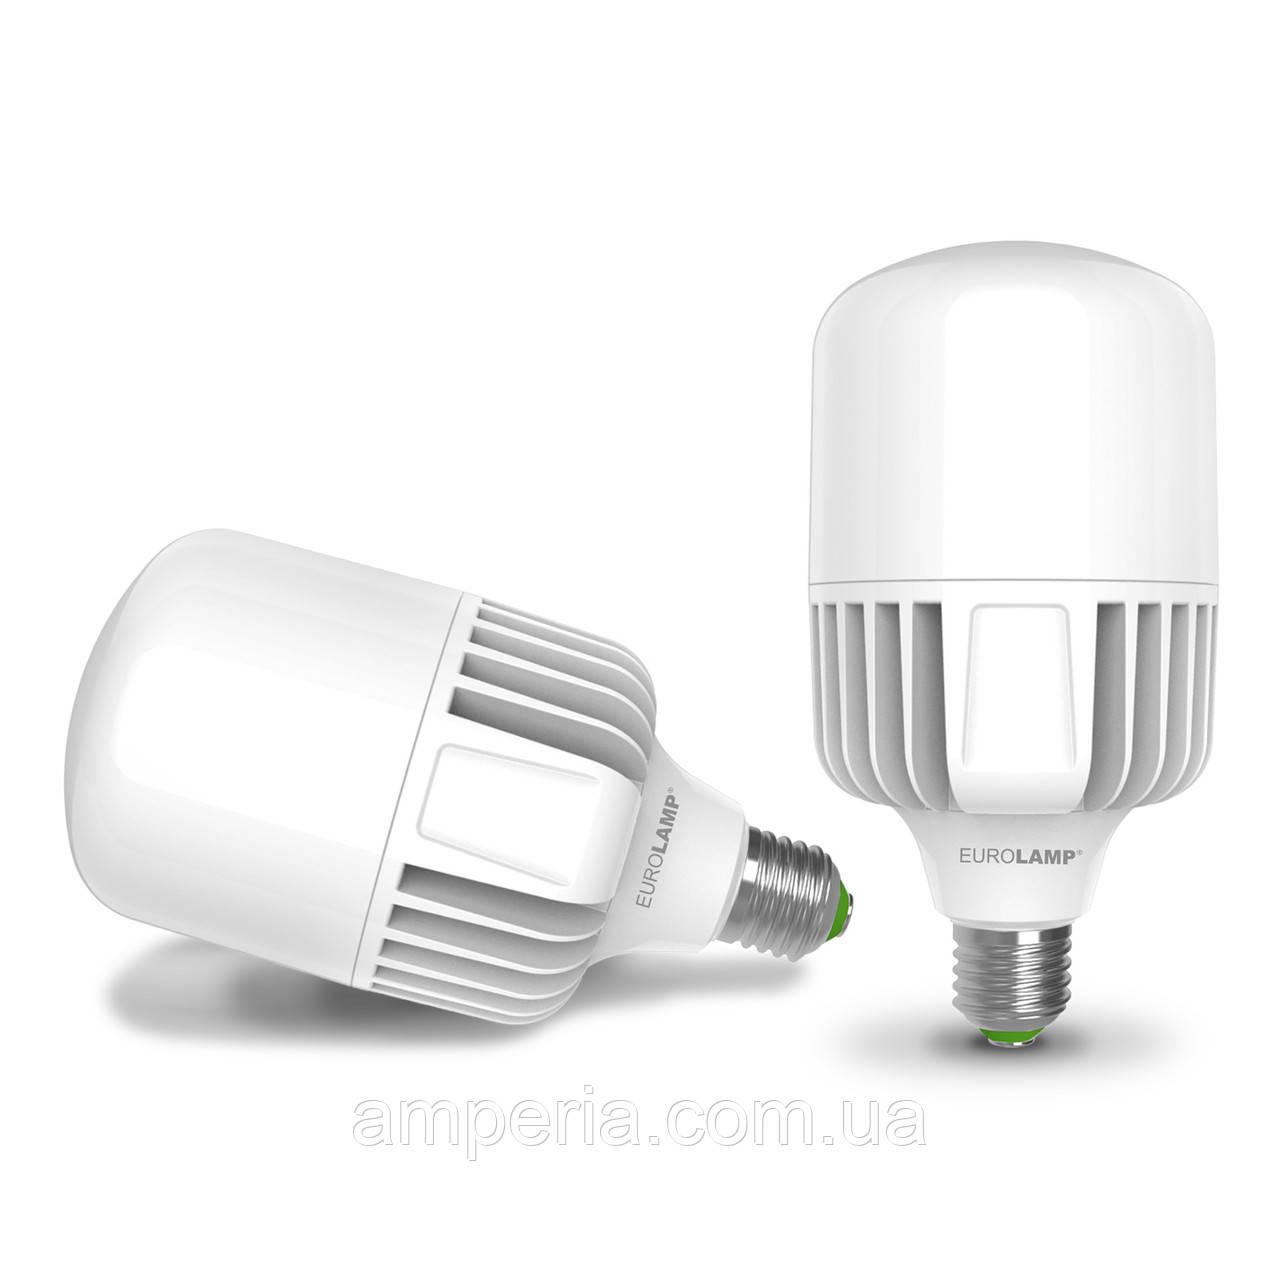 LED Лампа EUROLAMP високопотужна 100W E40 6500K (LED-HP-100406)